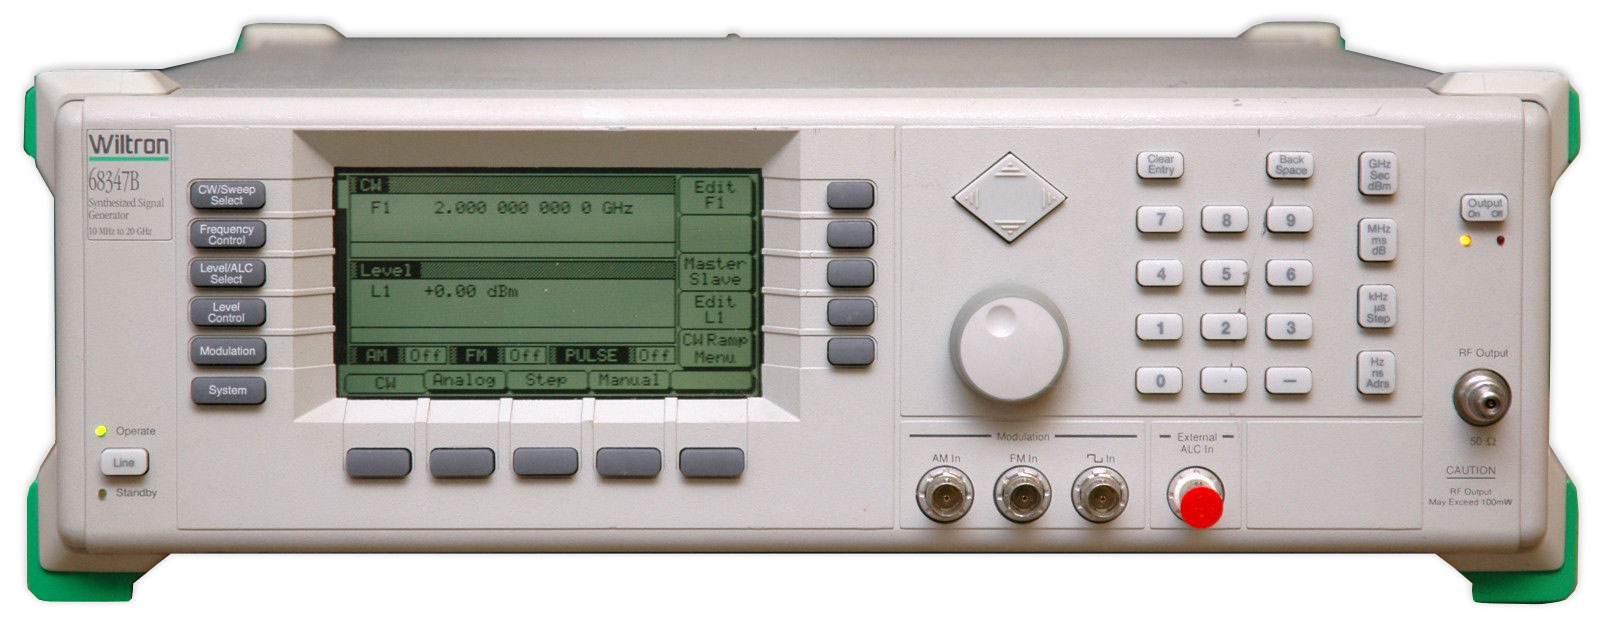 Rf Signal Generators Atec Rentals Programmable Levels High Speed Pulse Generator Anritsu 68347b Sweep 10mhz To 20ghz